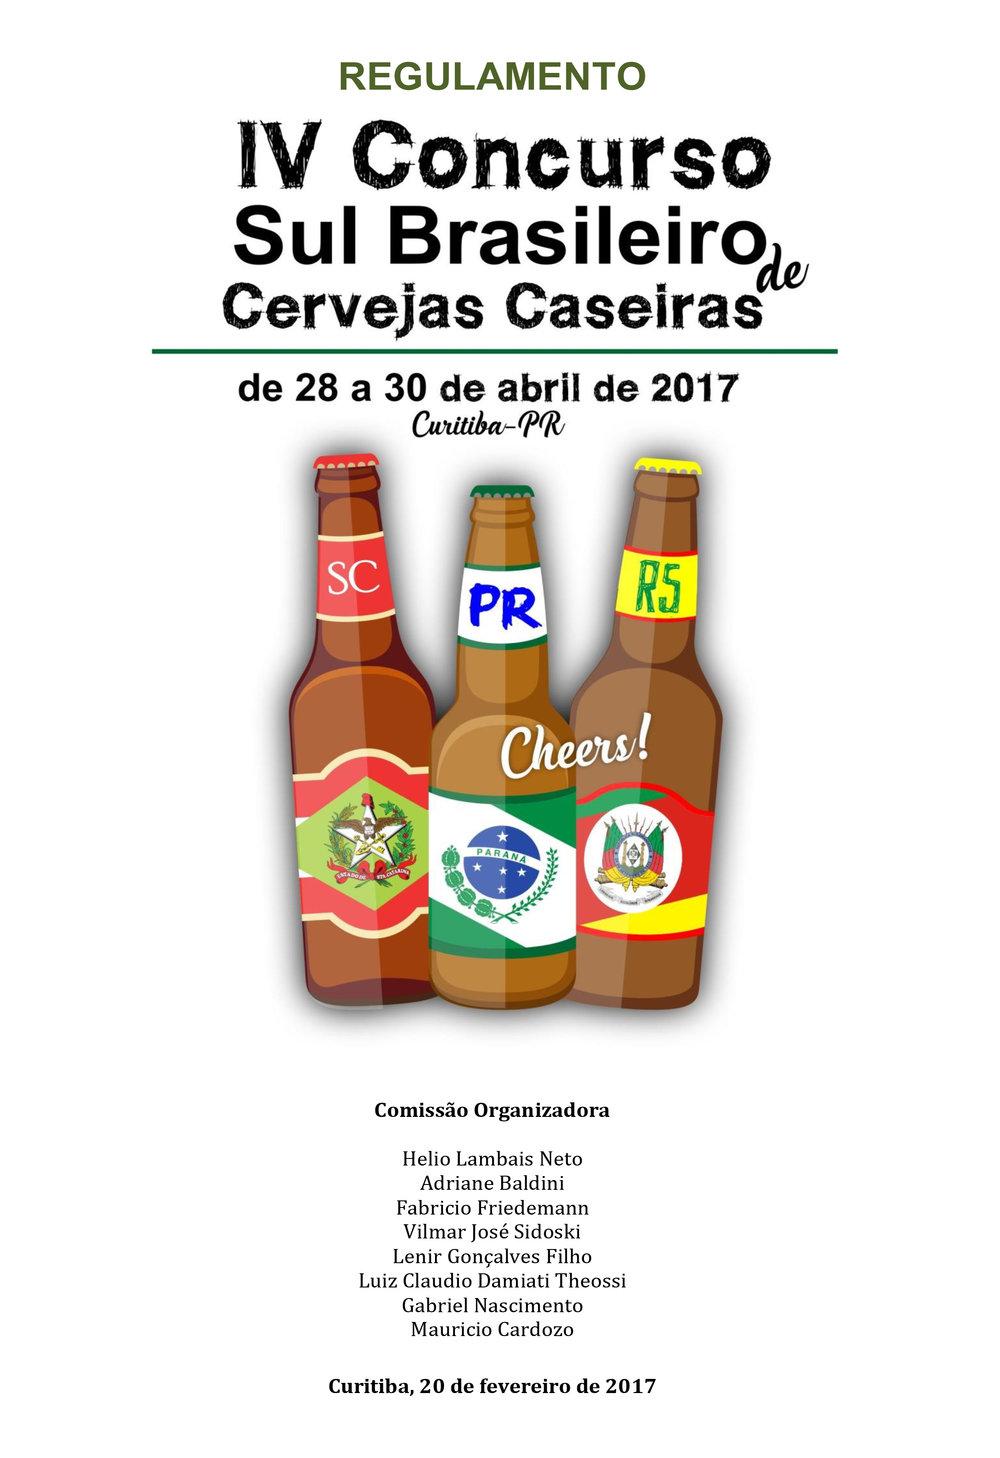 IV Concurso Sulbrasileiro 2017-Regulamento-1.jpg